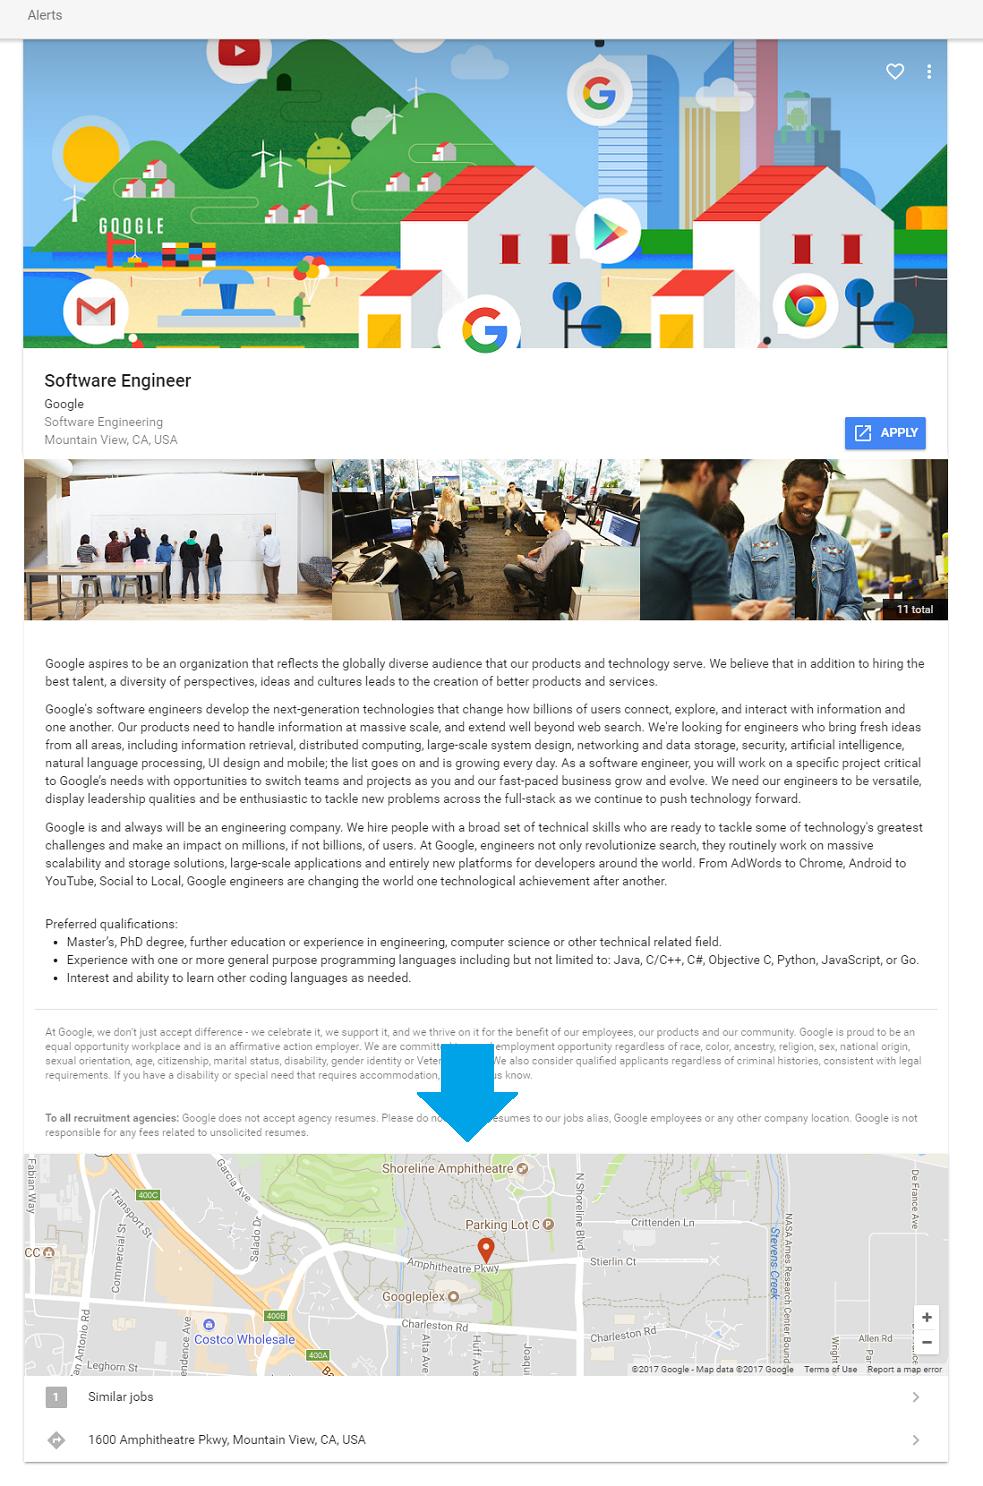 Map on Google Job Description